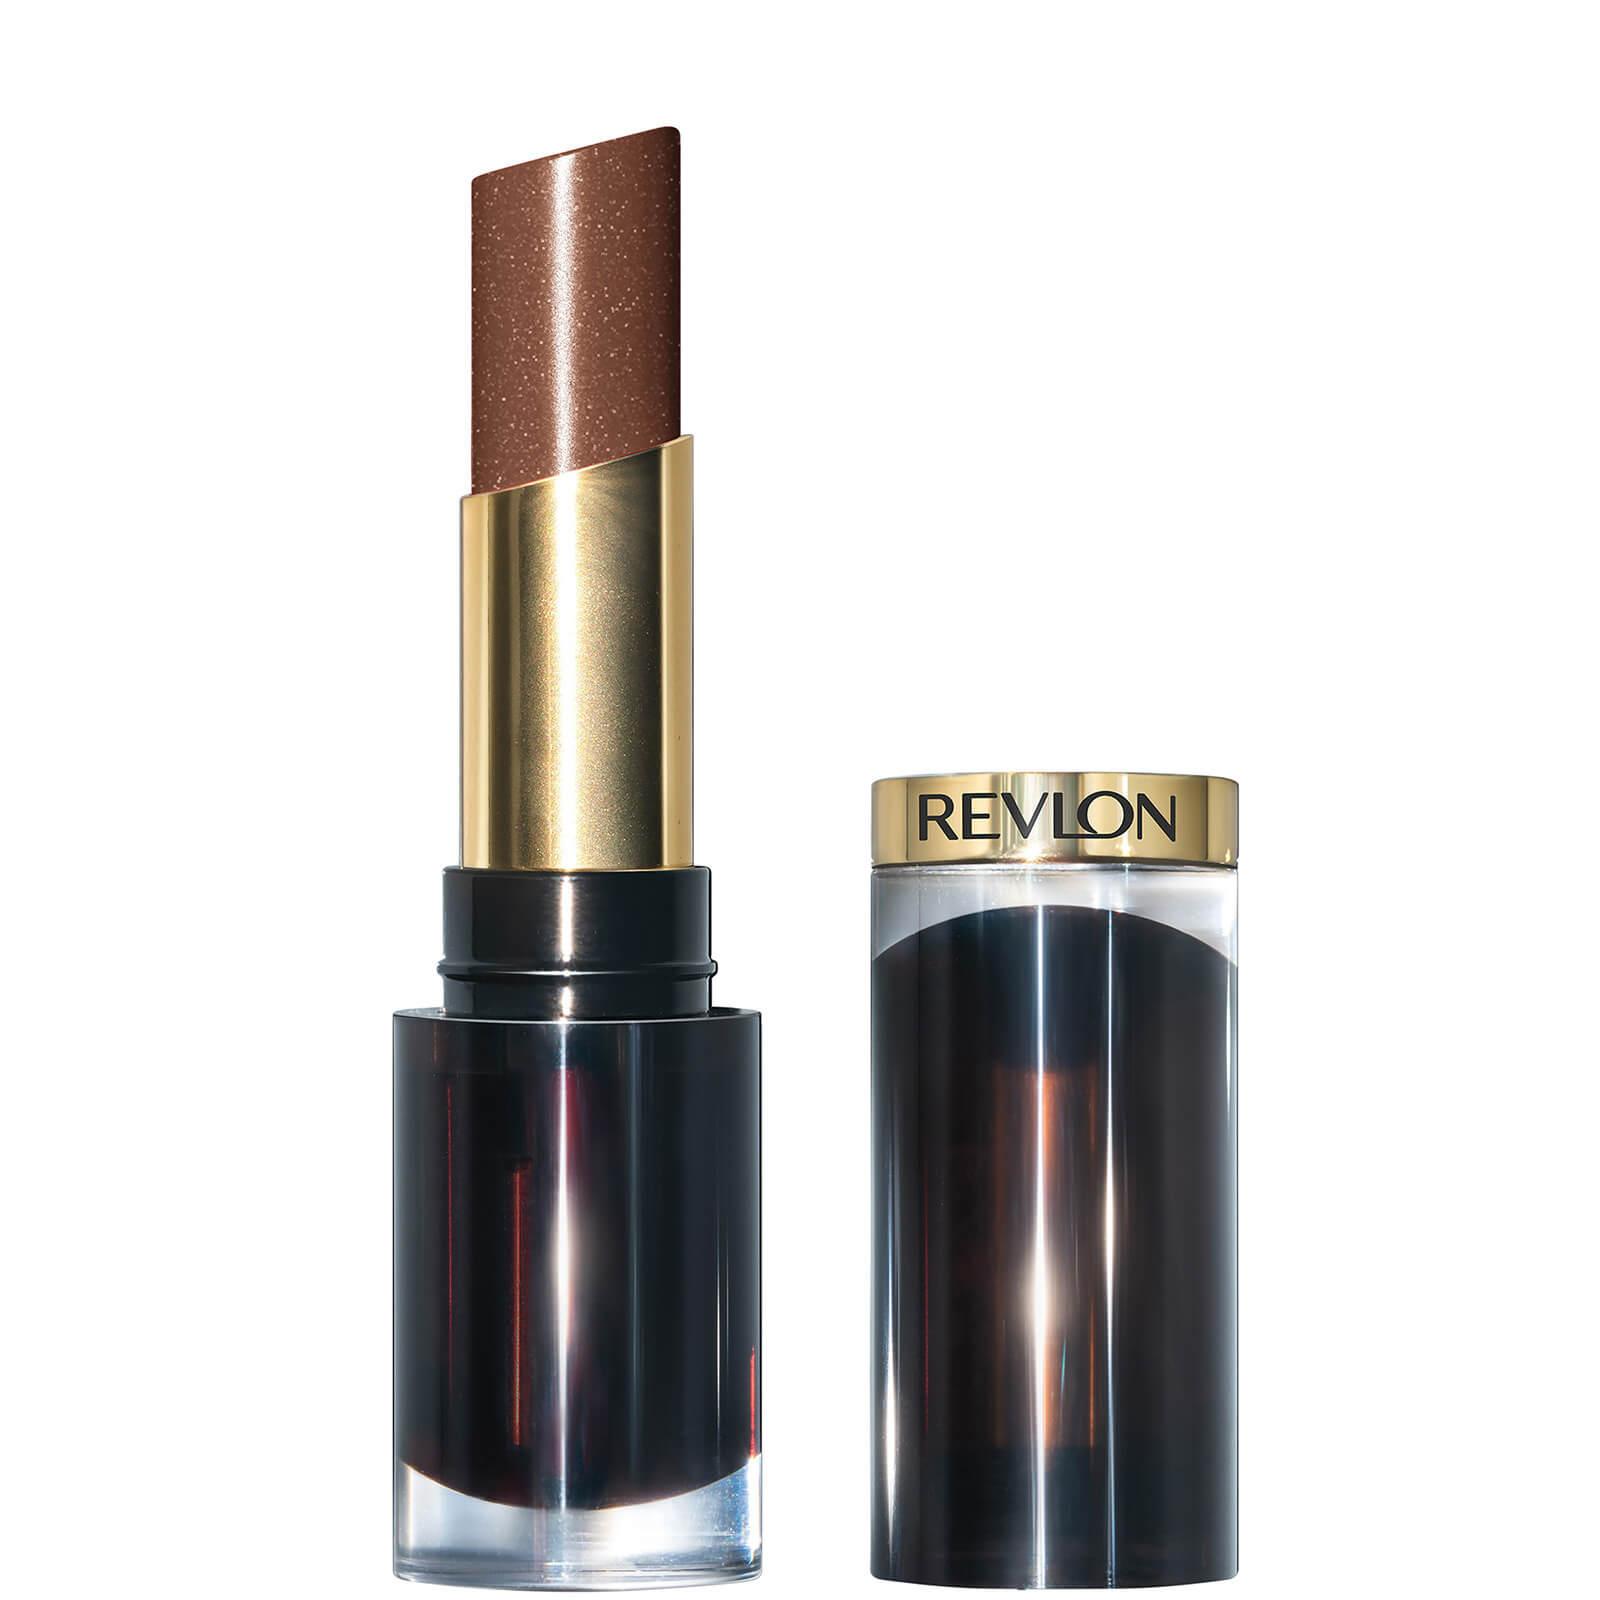 Купить Revlon Super Lustrous Glass Shine 4.2ml (Various Shades) - Sparkling Honey